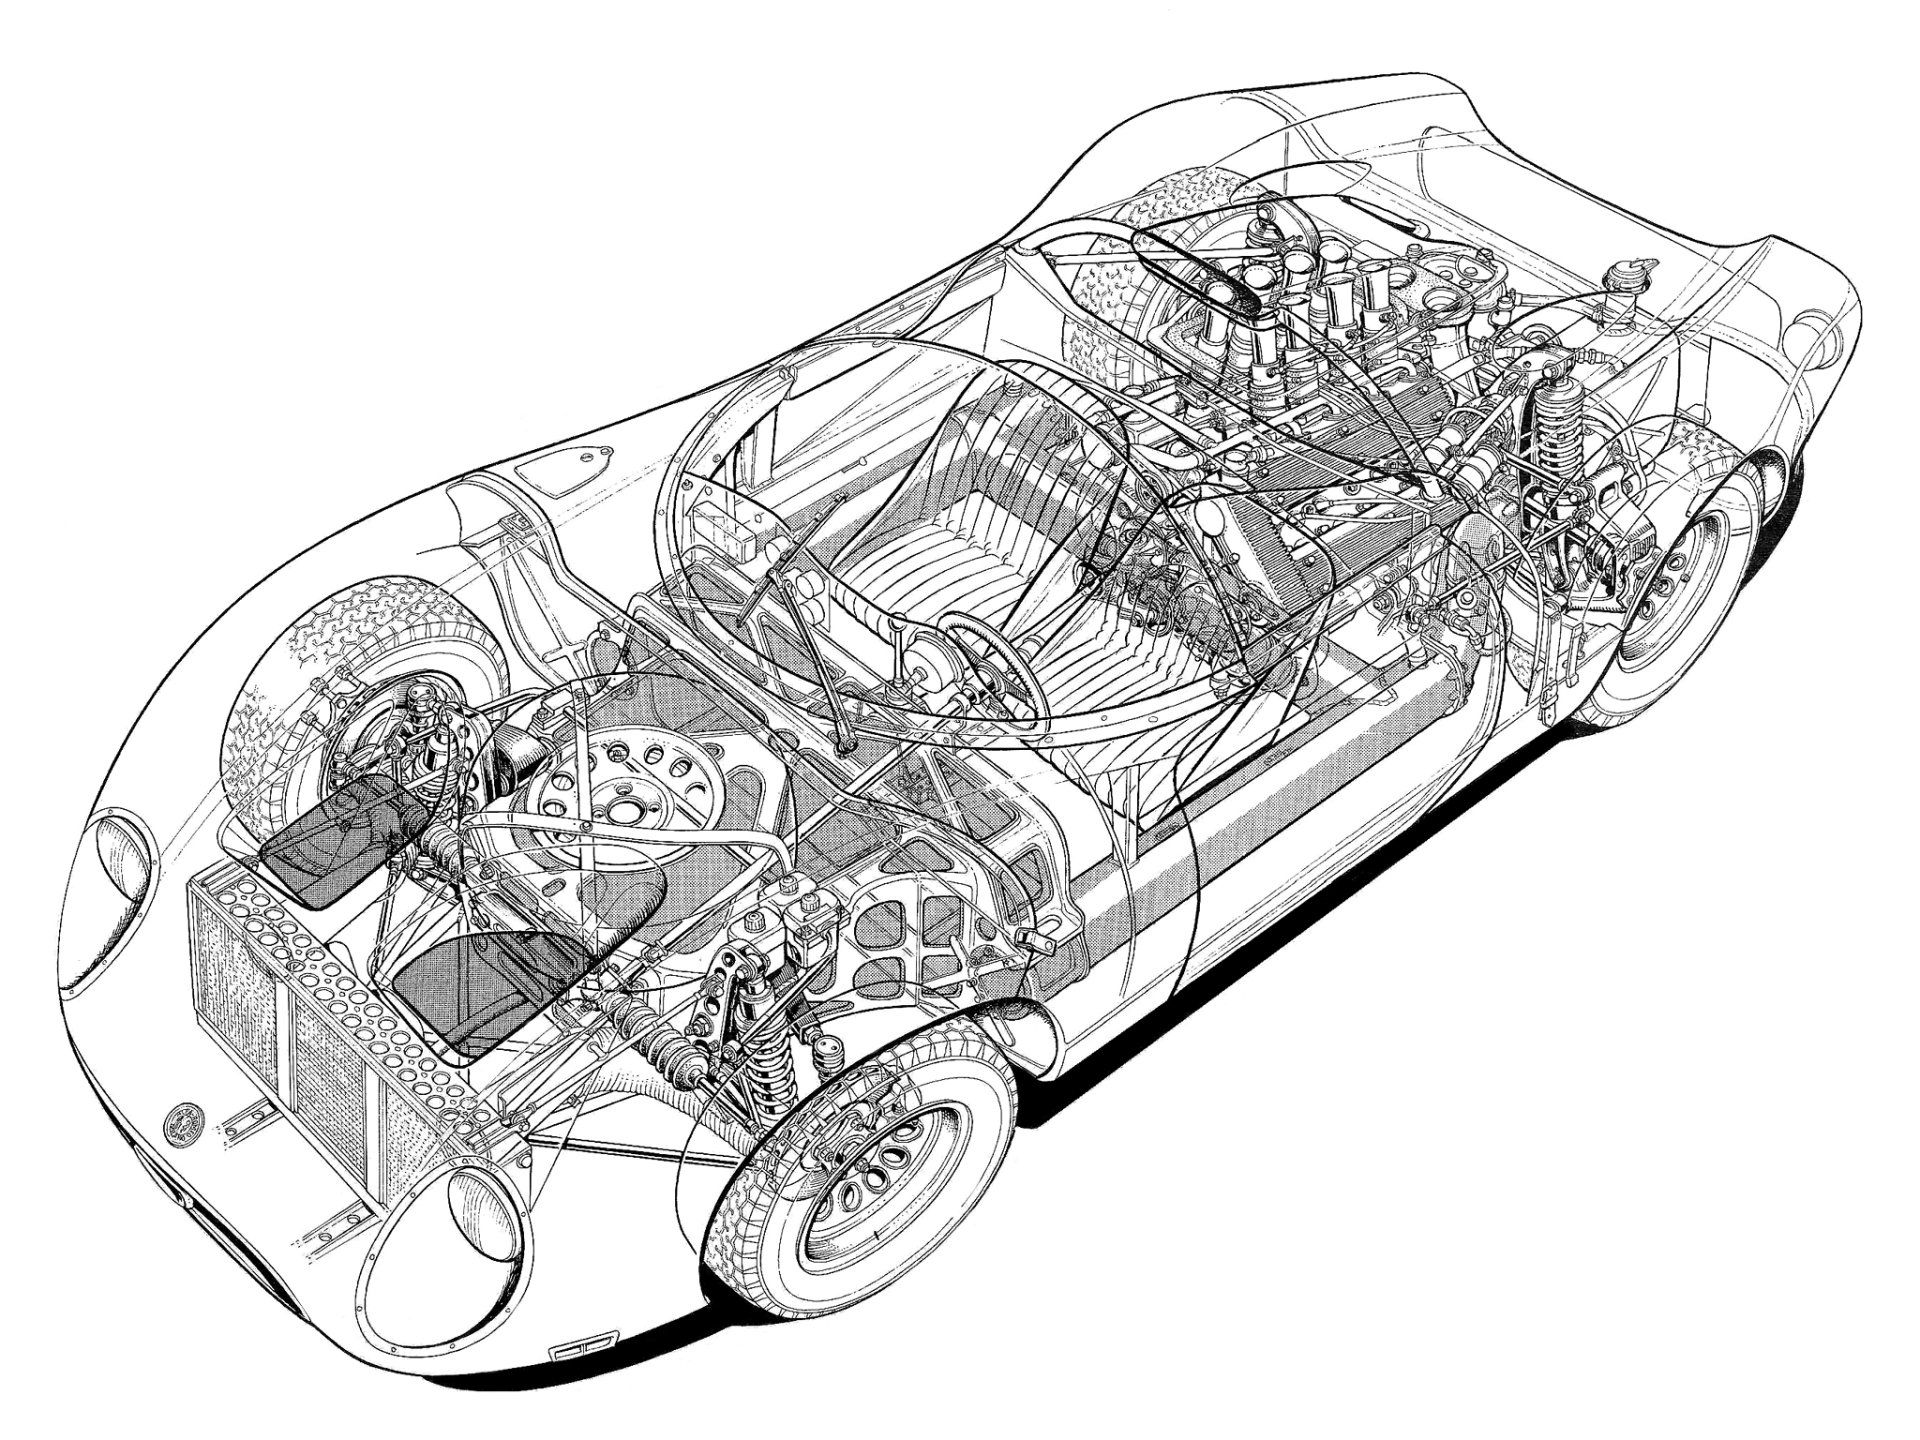 alfa romeo tipo 33 2 fleron 1967 68 clubman s cars alfa romeo 1958 Jaguar Coupe alfa romeo tipo 33 2 fleron 1967 68